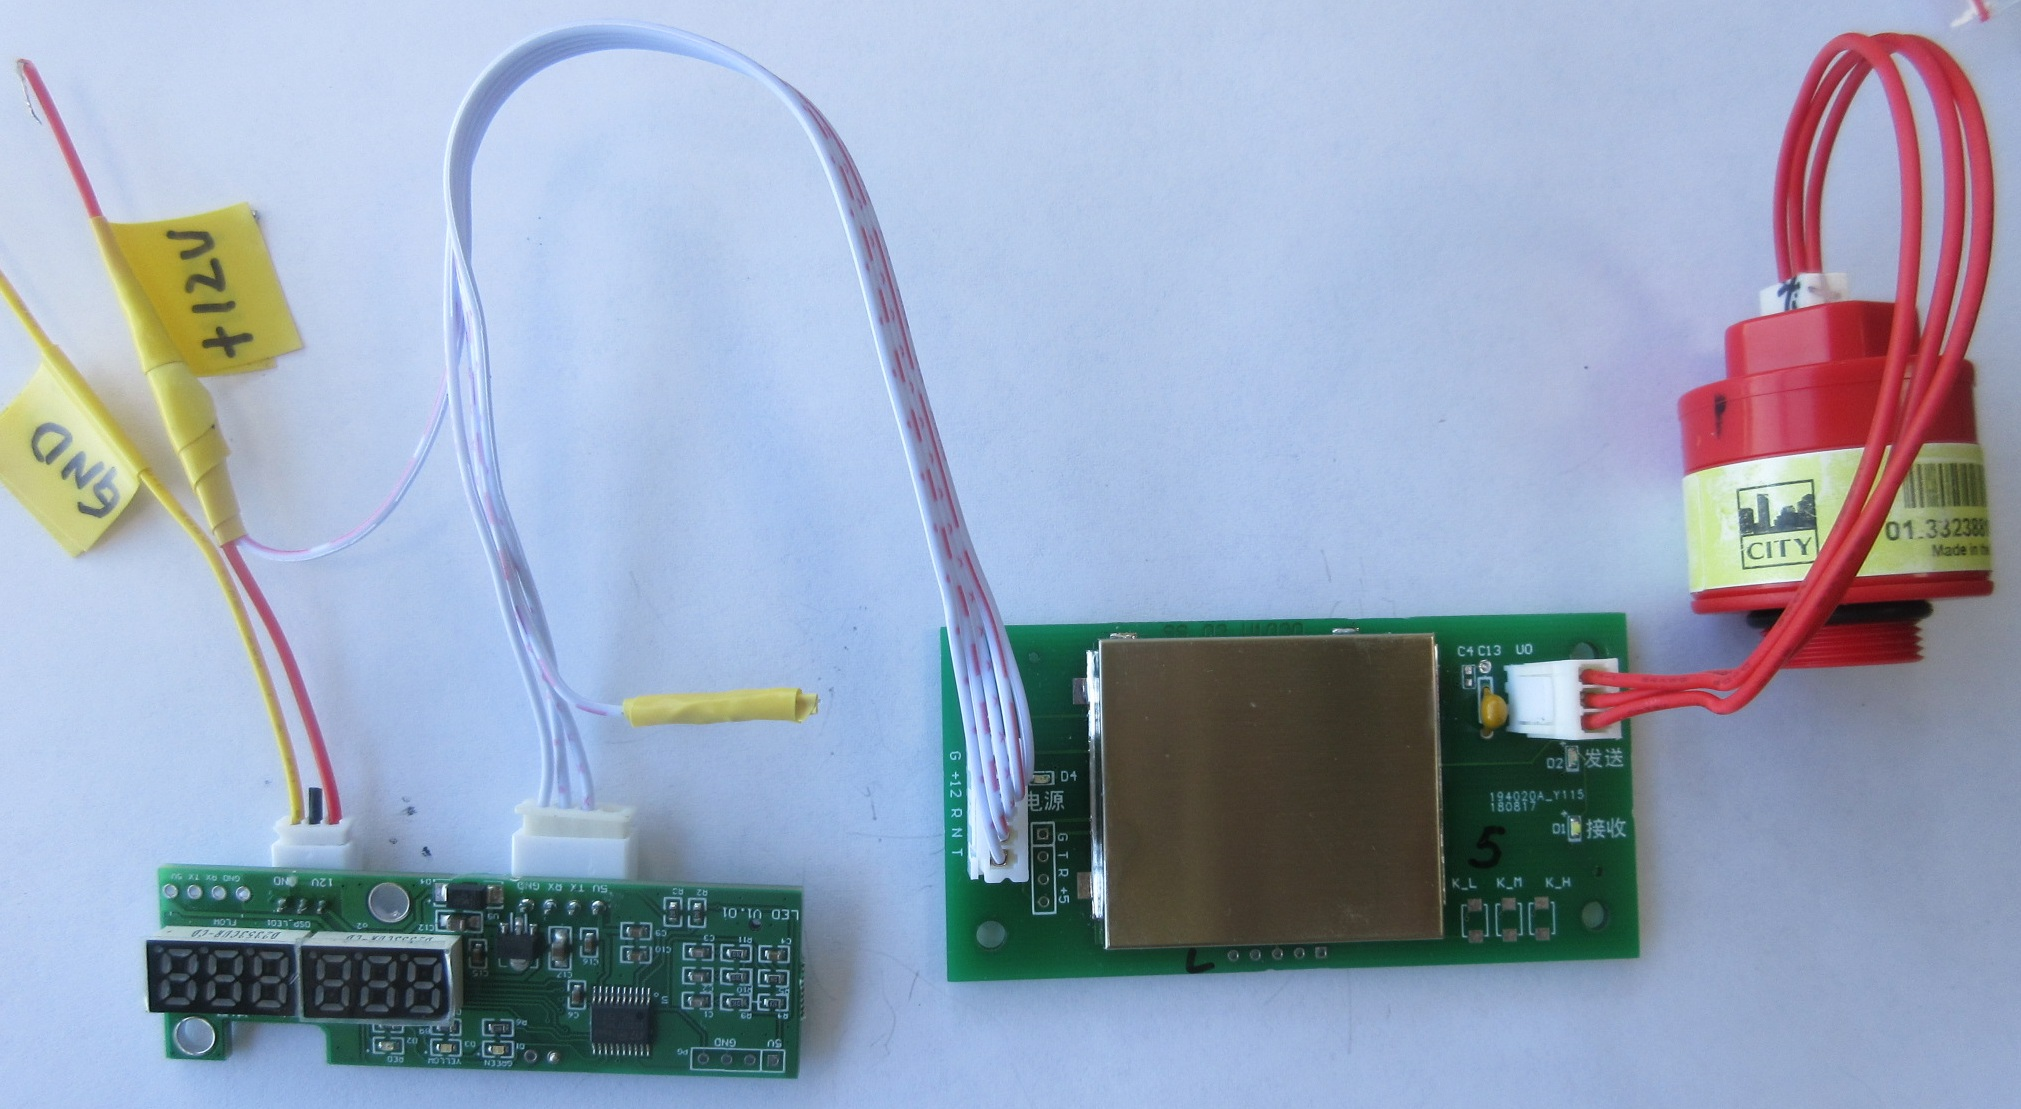 AO2 Sensor-Special Transmitter, Oxygen Sensor, Oxygen Transmitter, AO2, AO3